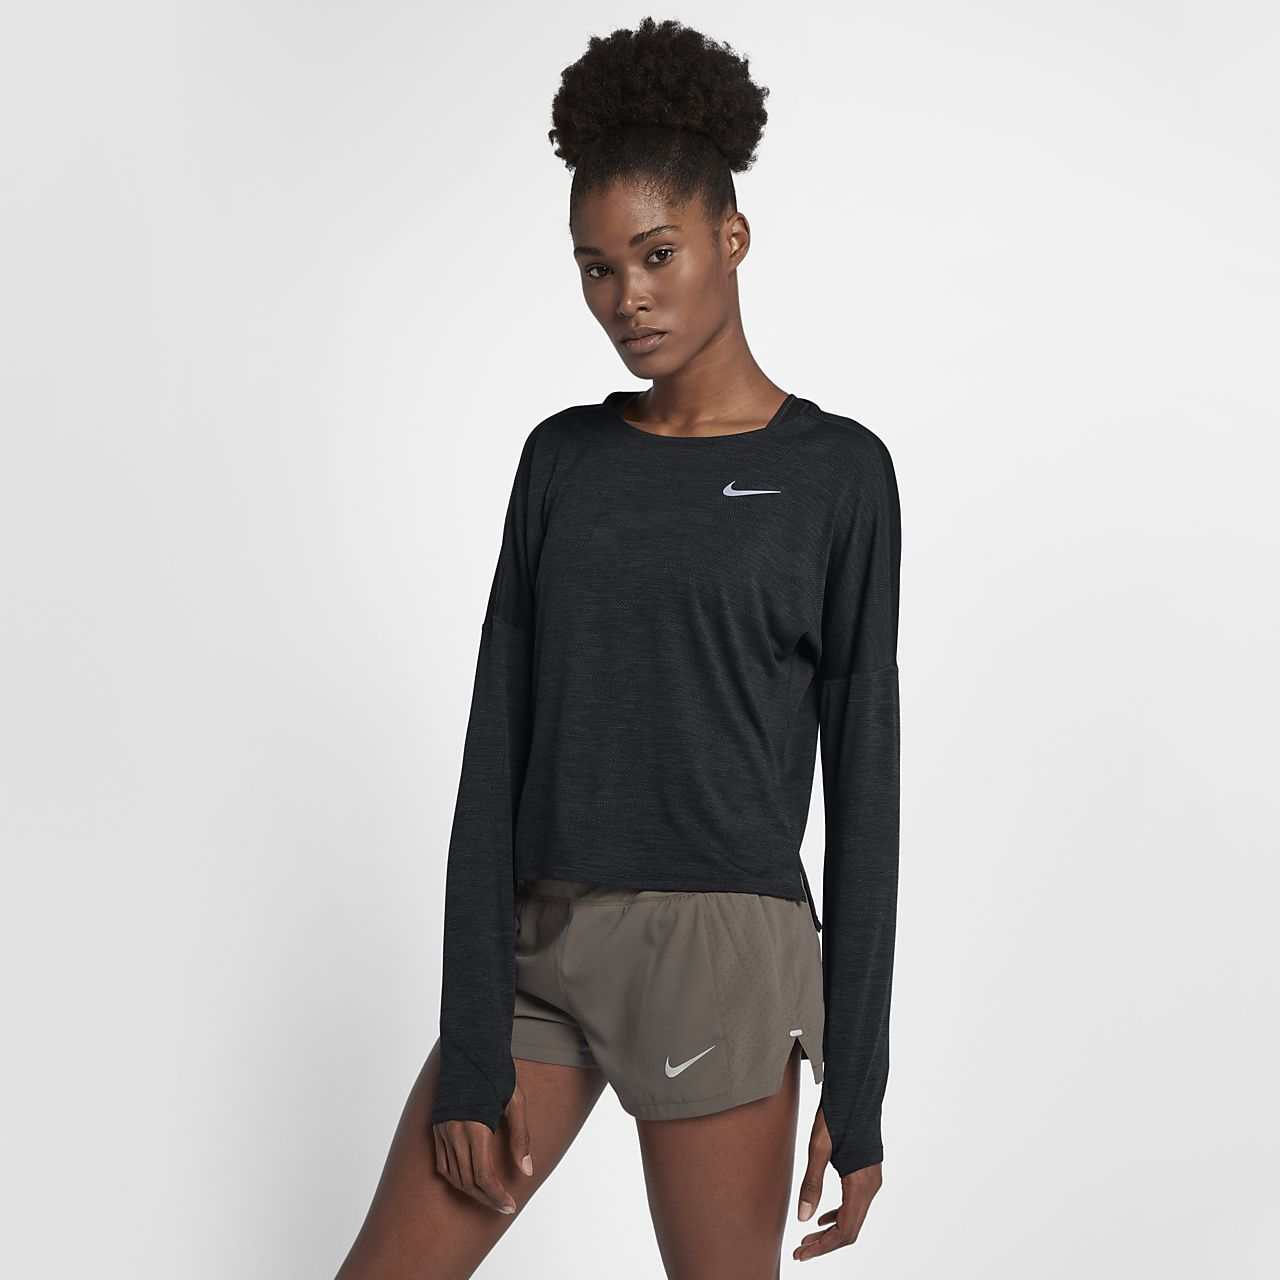 Nike Dri-FIT Medalist Women Long-Sleeve Running Top